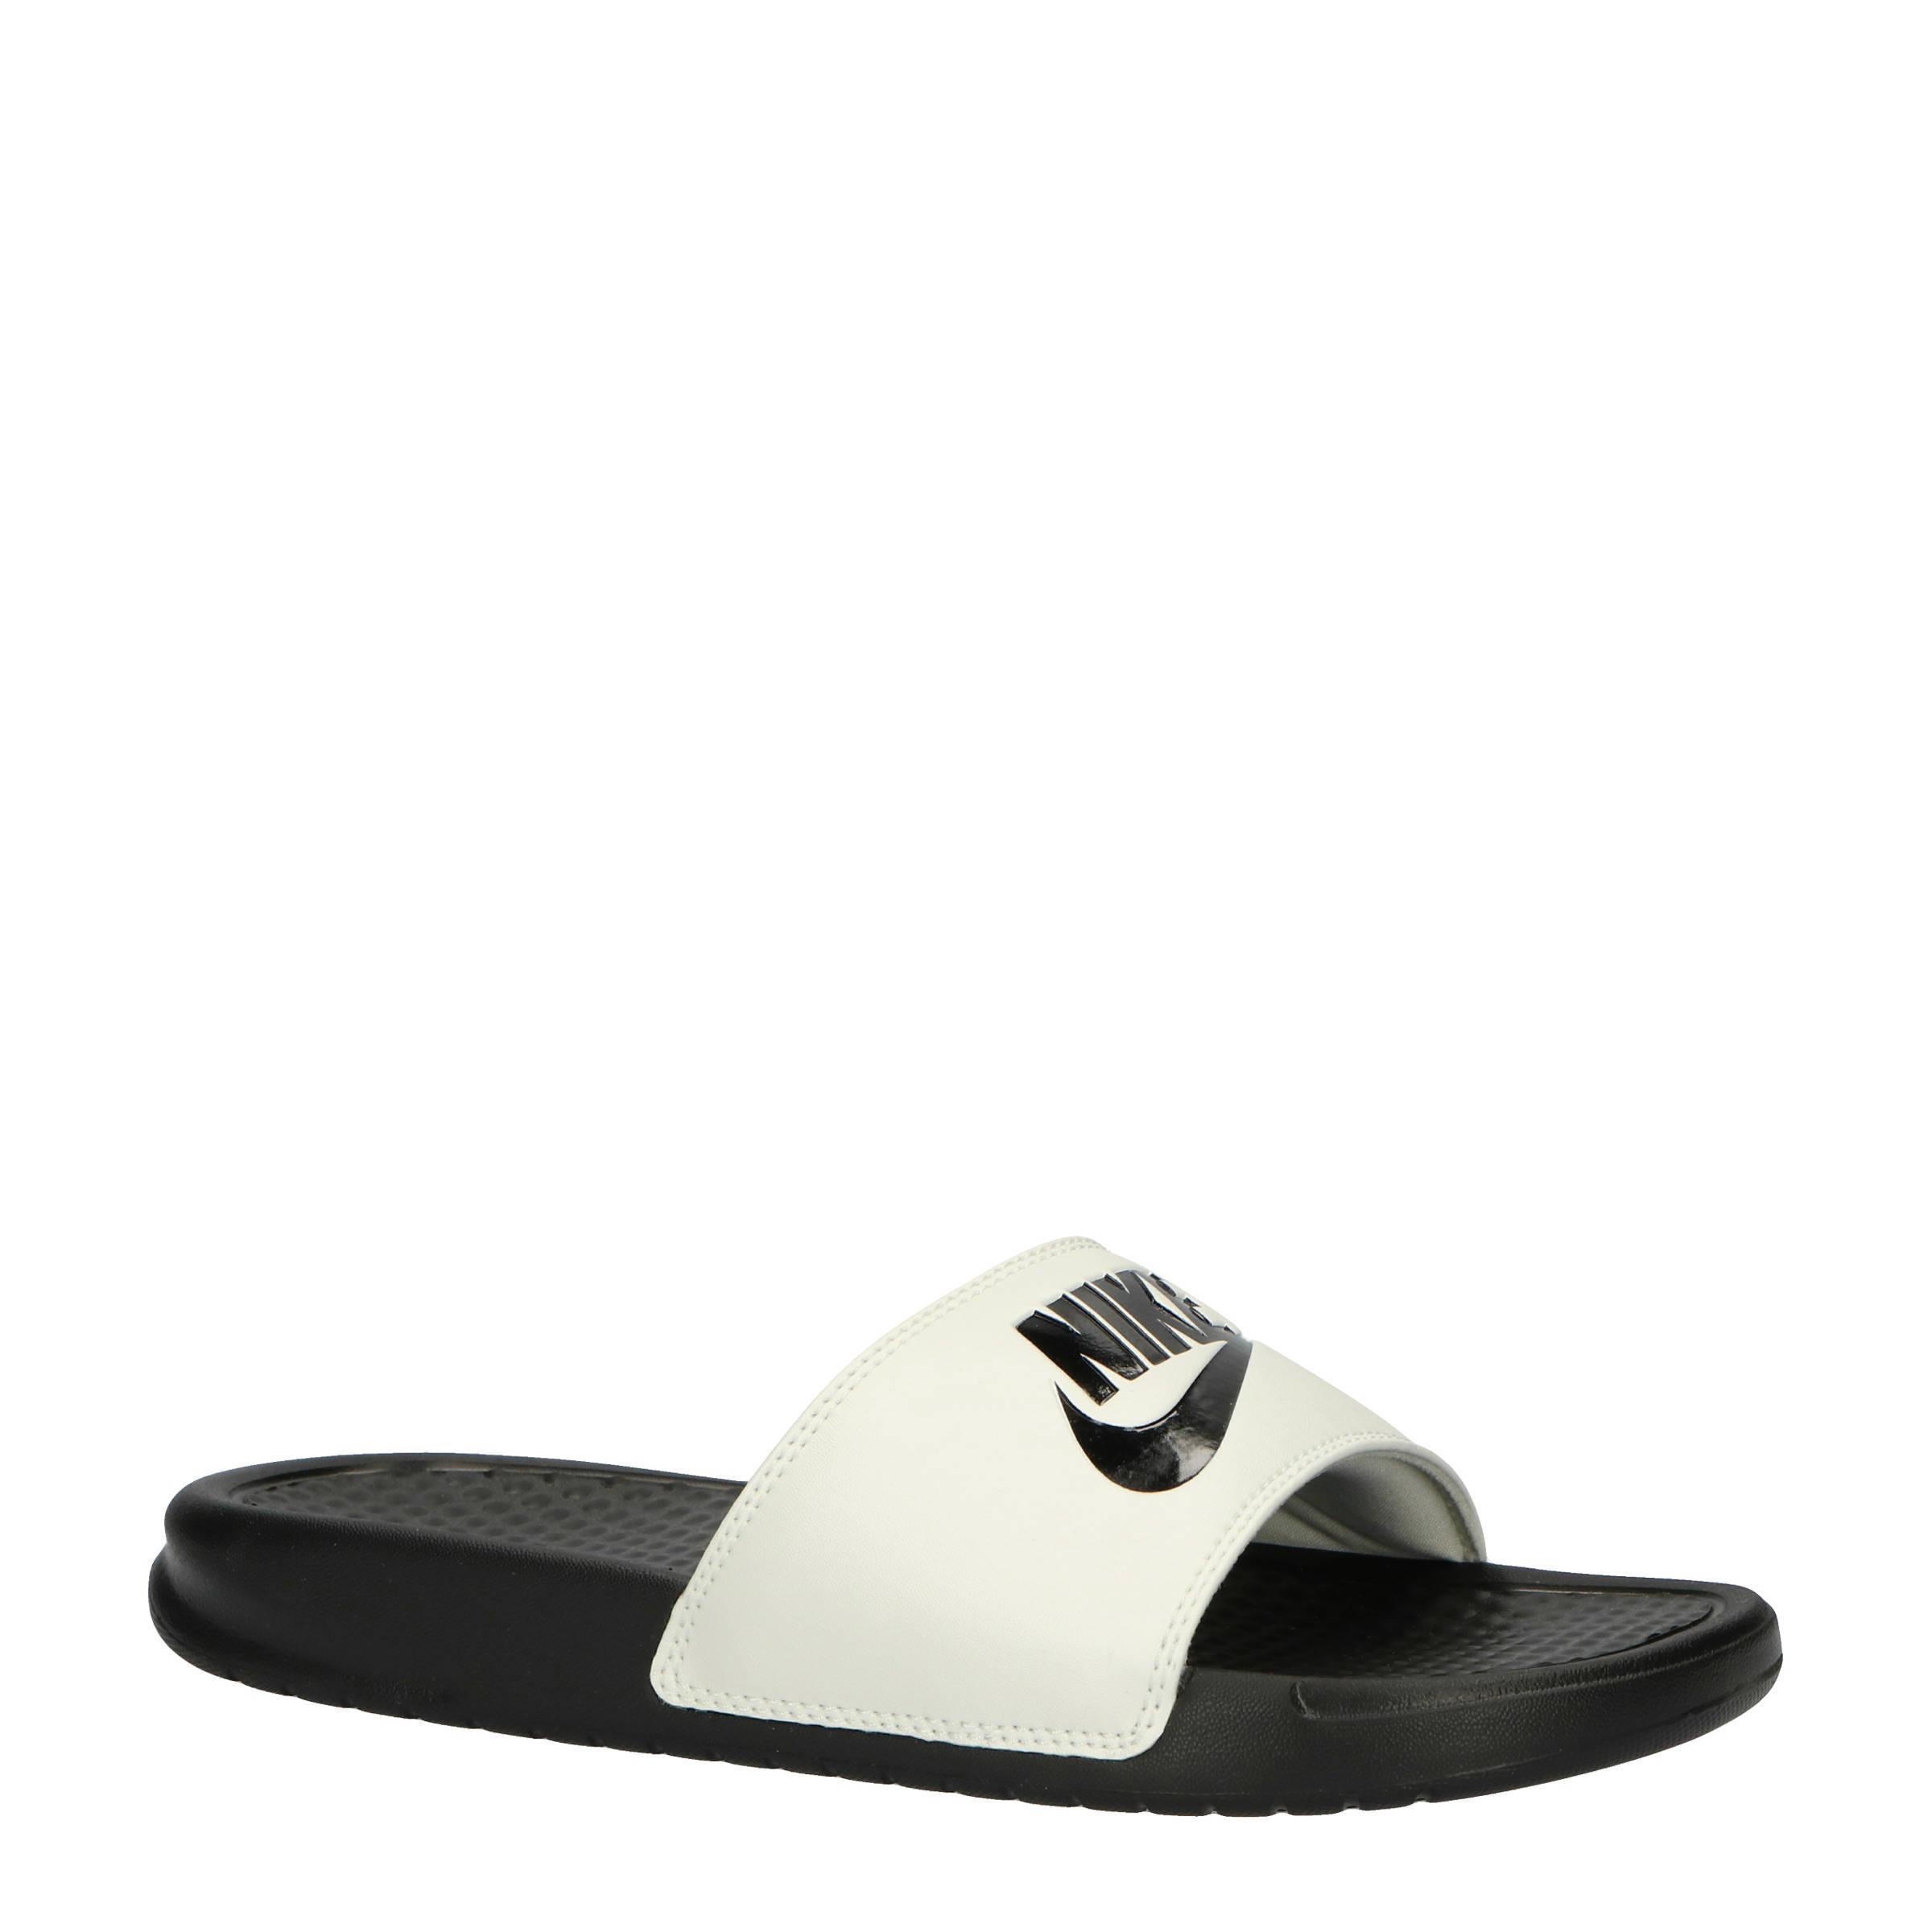 d32e8ac0b77 Nike slippers Benassi JDI zwart/wit | wehkamp